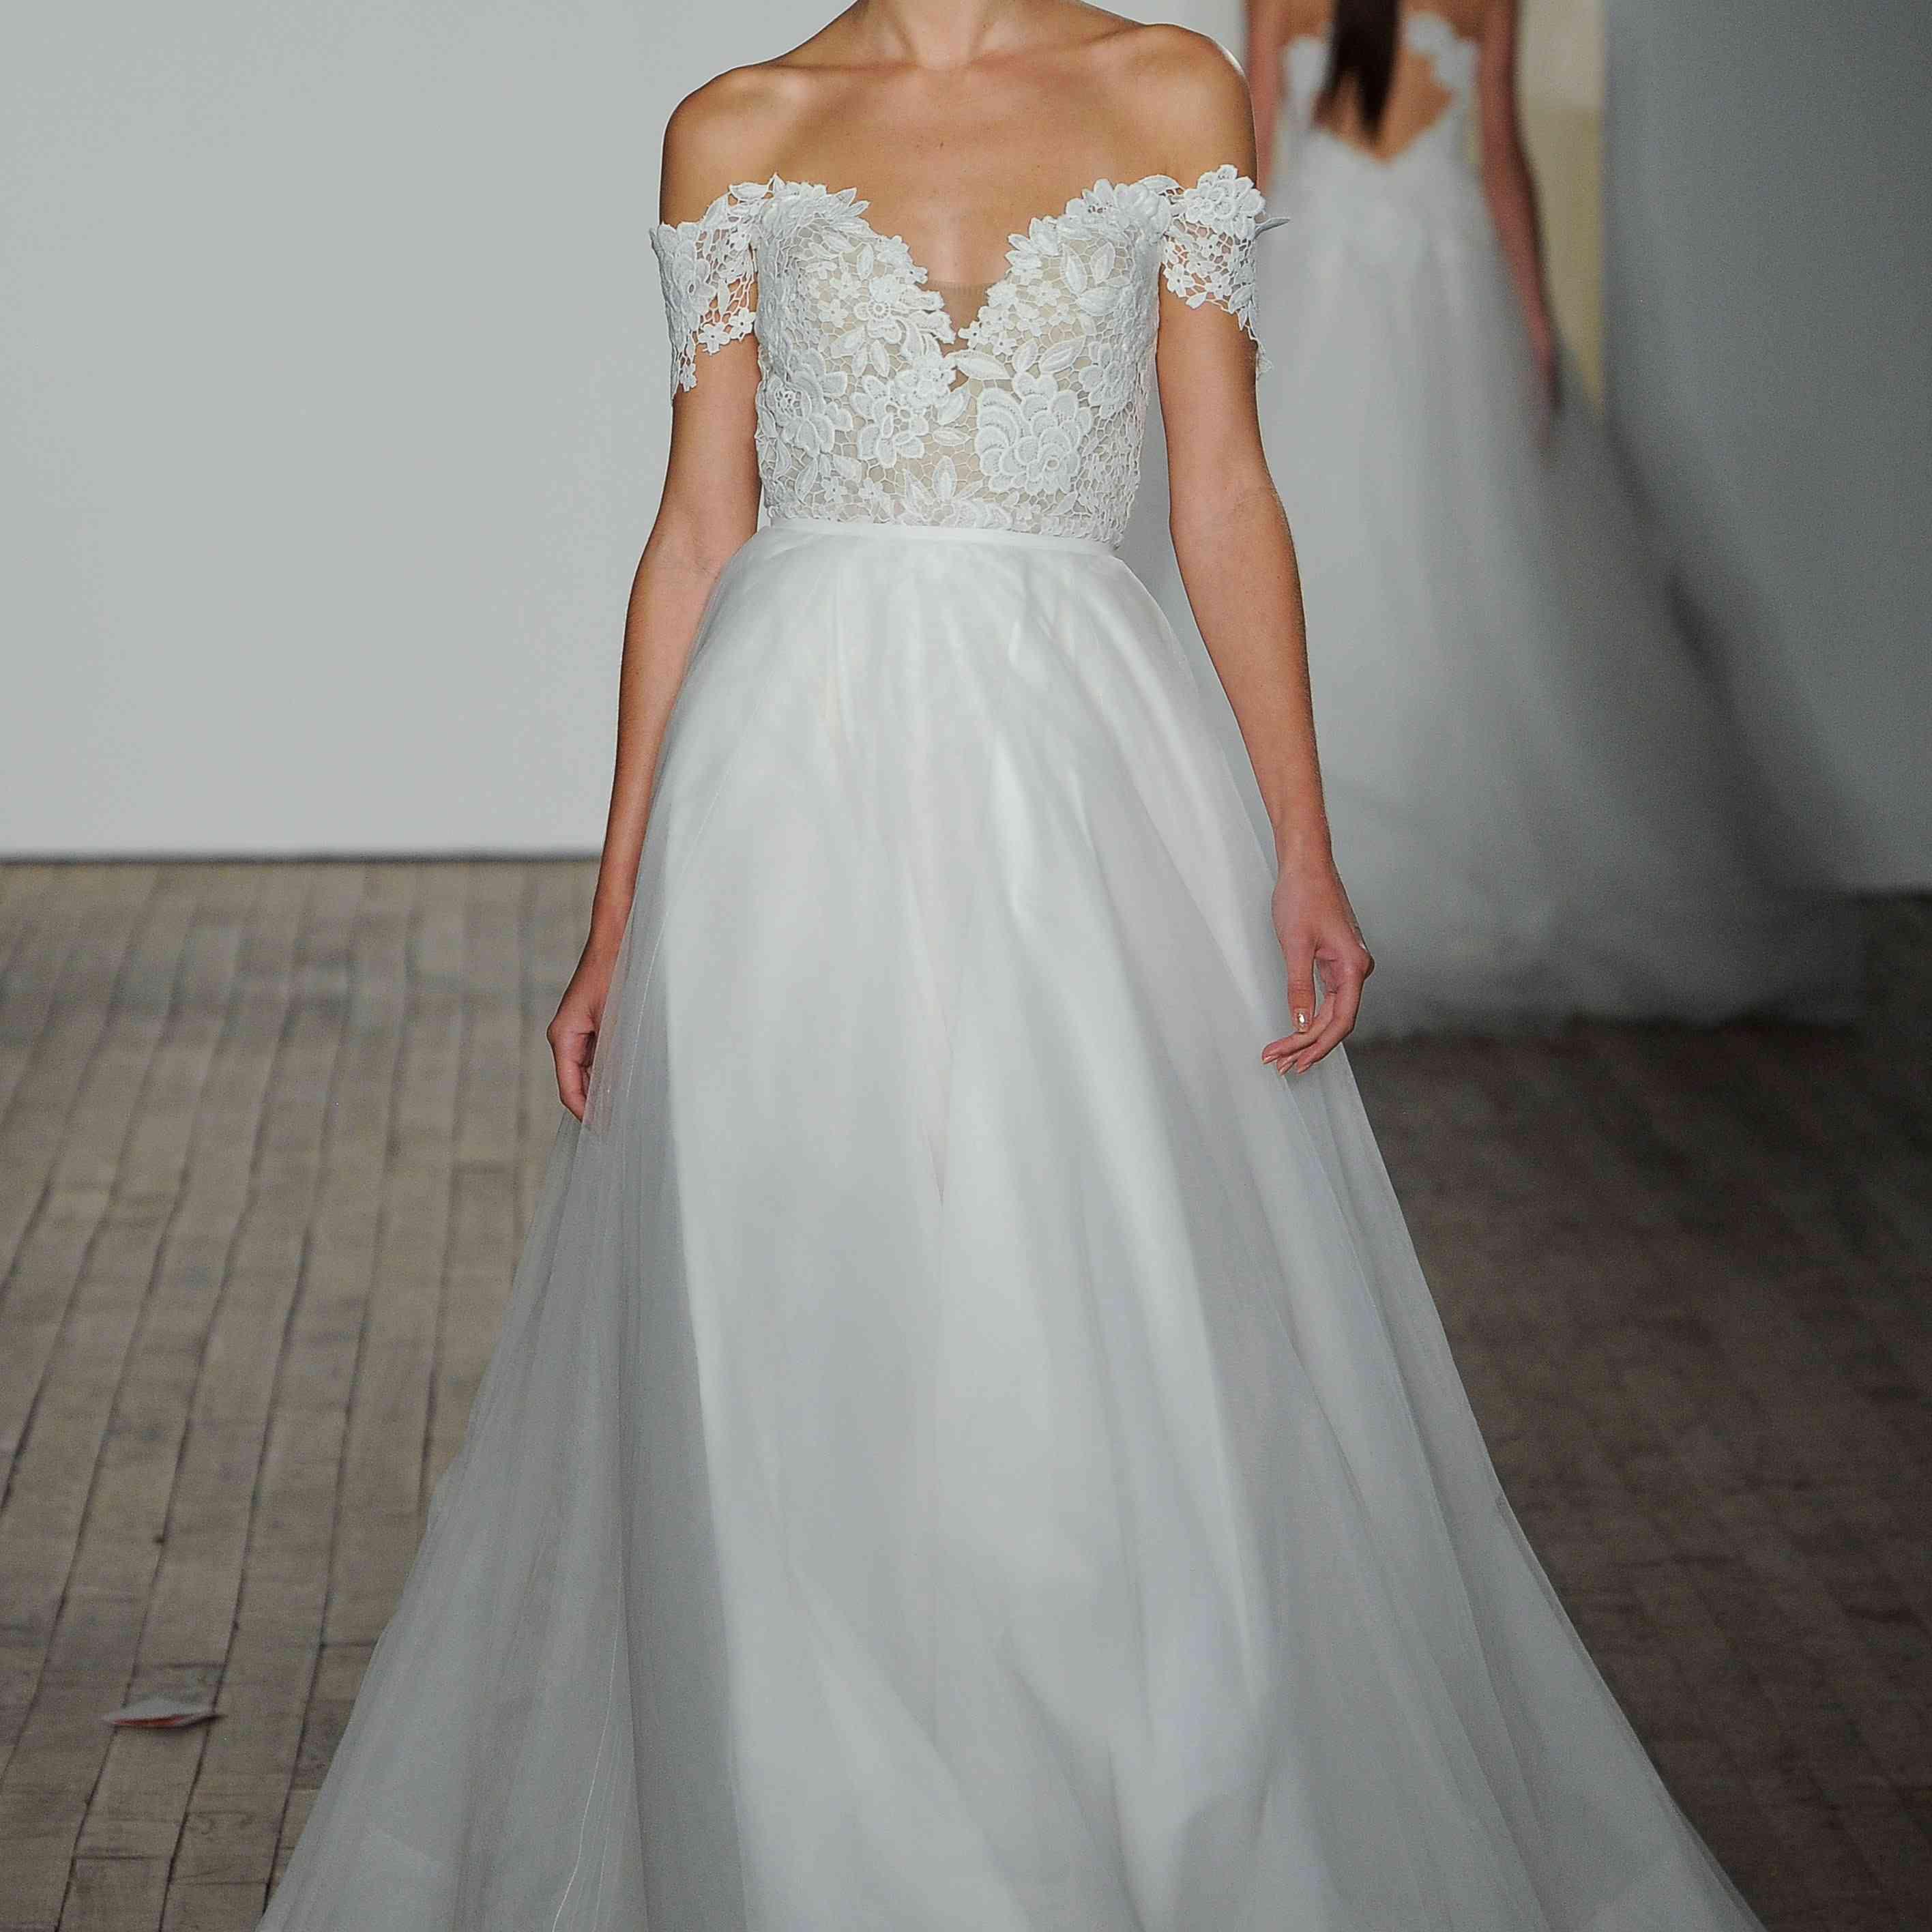 Jojo off-the-shoulder wedding dress